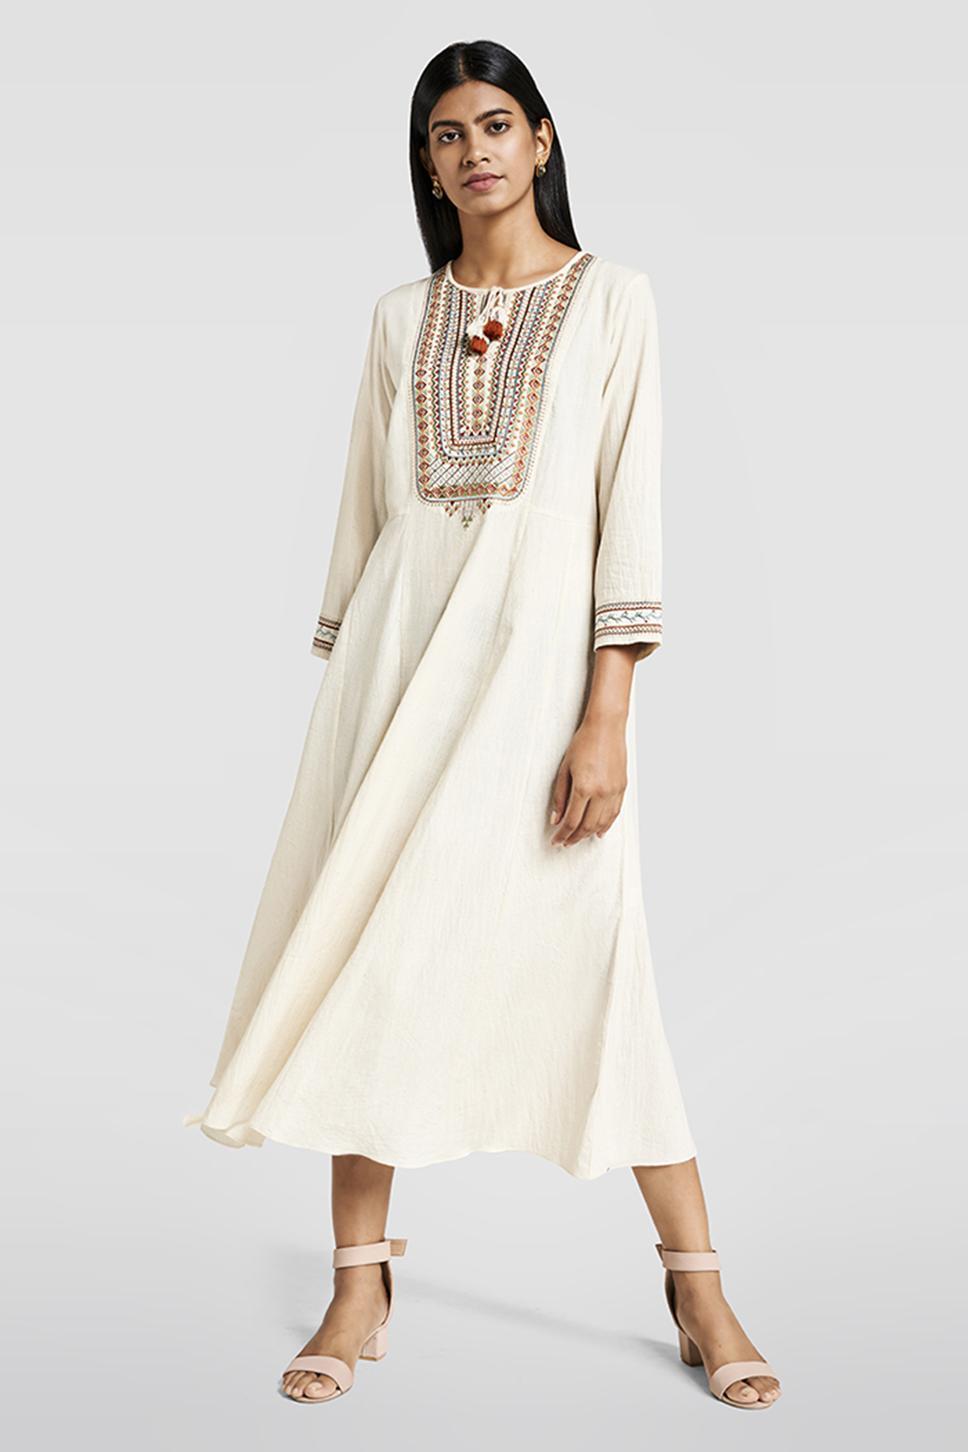 Matte White Embroidered Dress